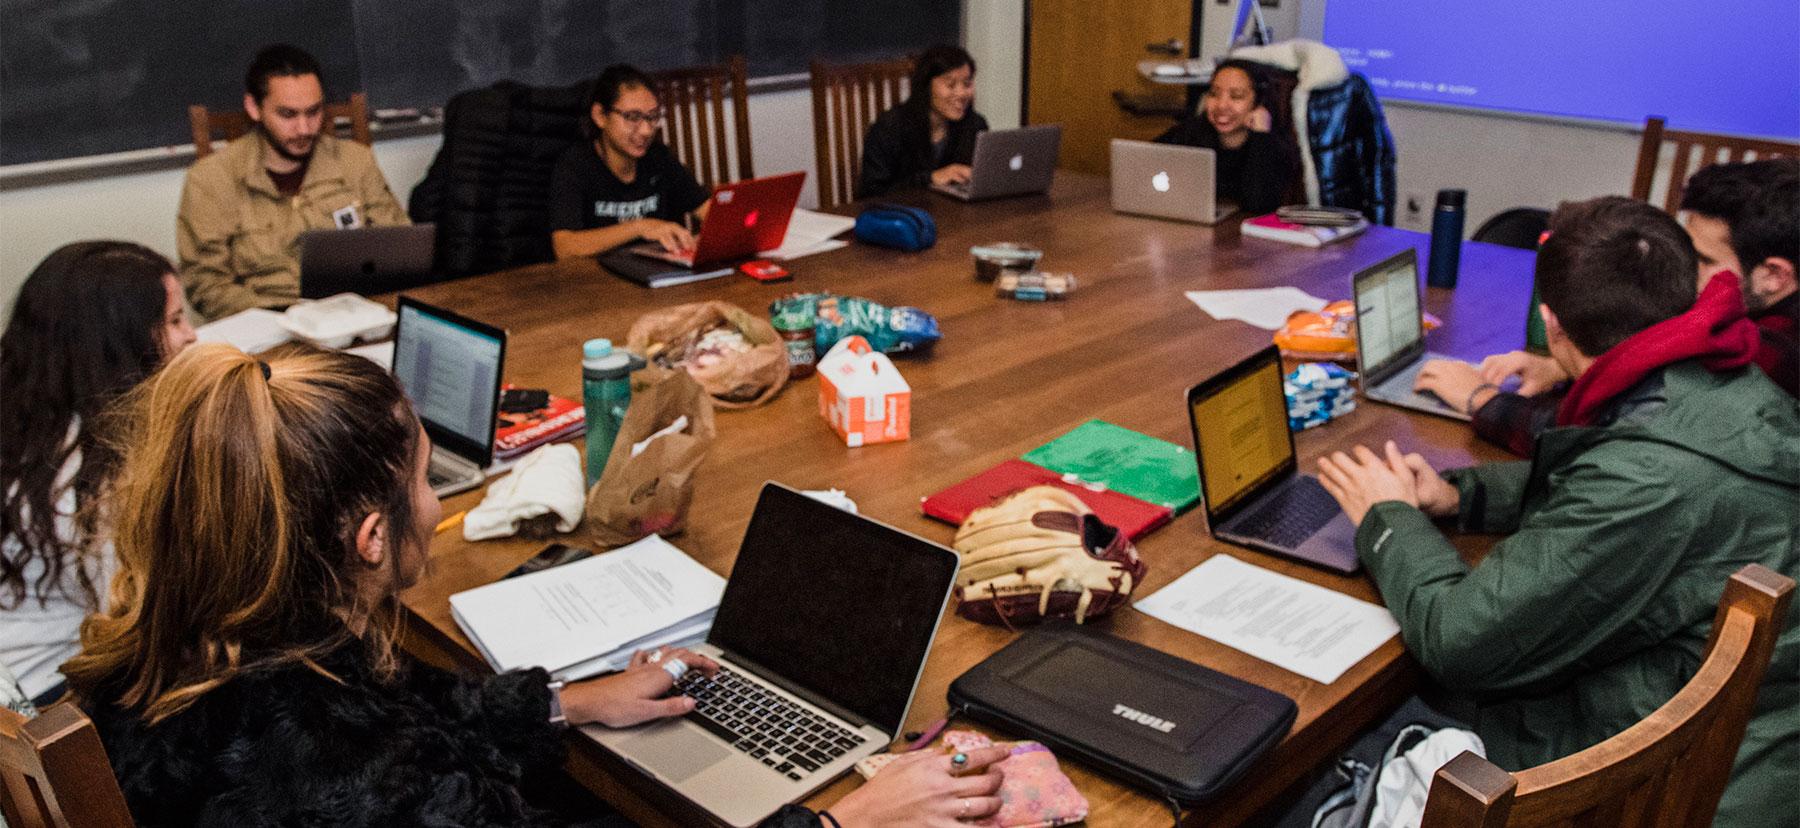 A peer-led team learning workshop